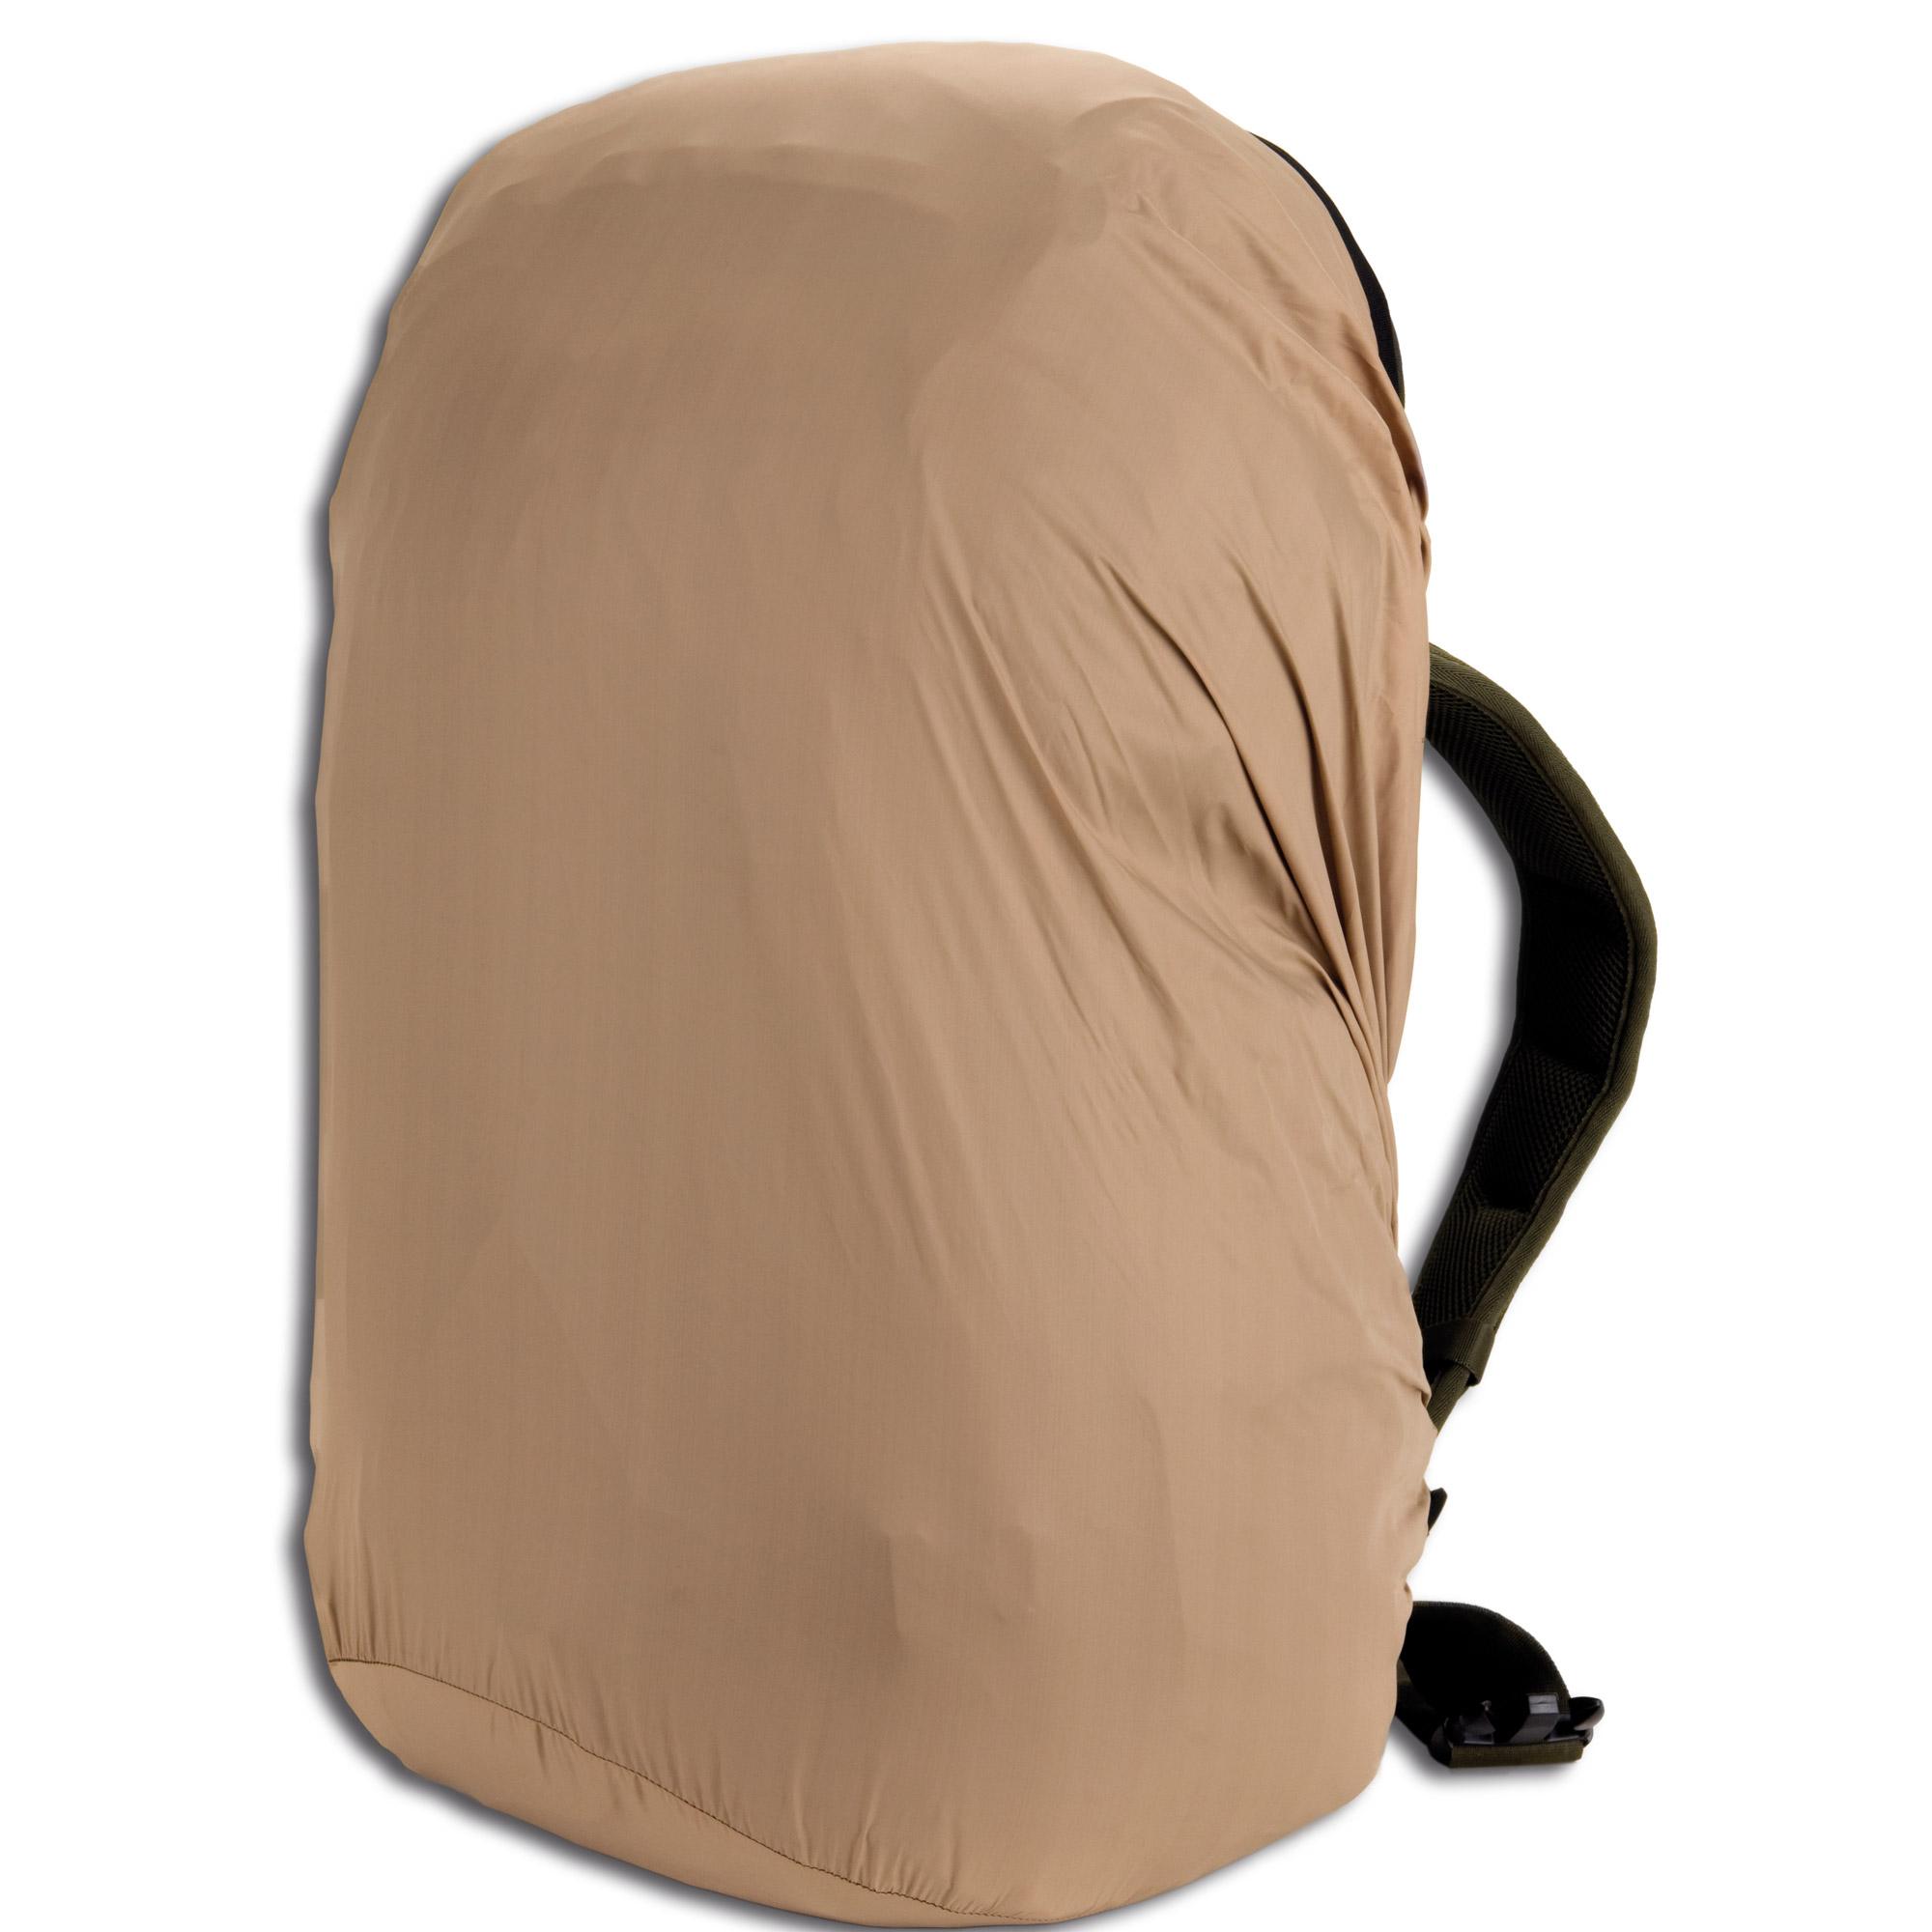 Snugpak Rucksackbezug Aquacover 70 L desert tan